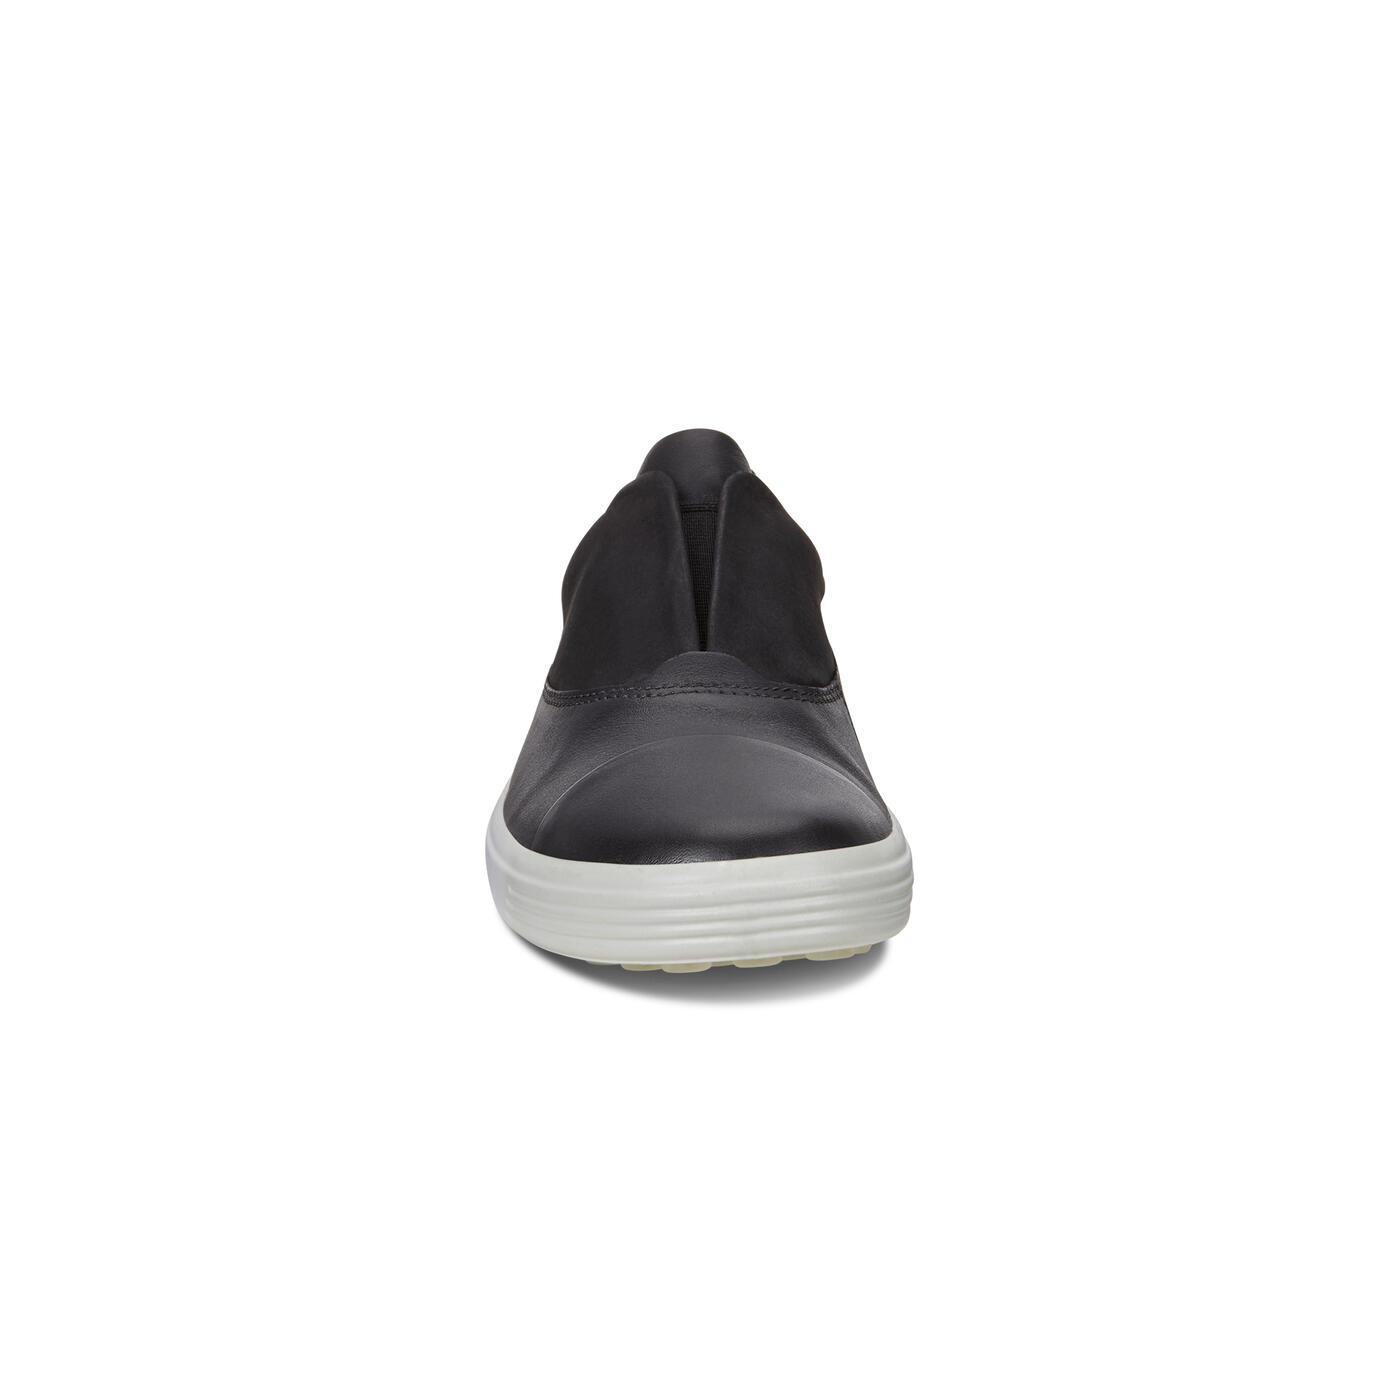 ECCO SOFT 7 W Slip-on